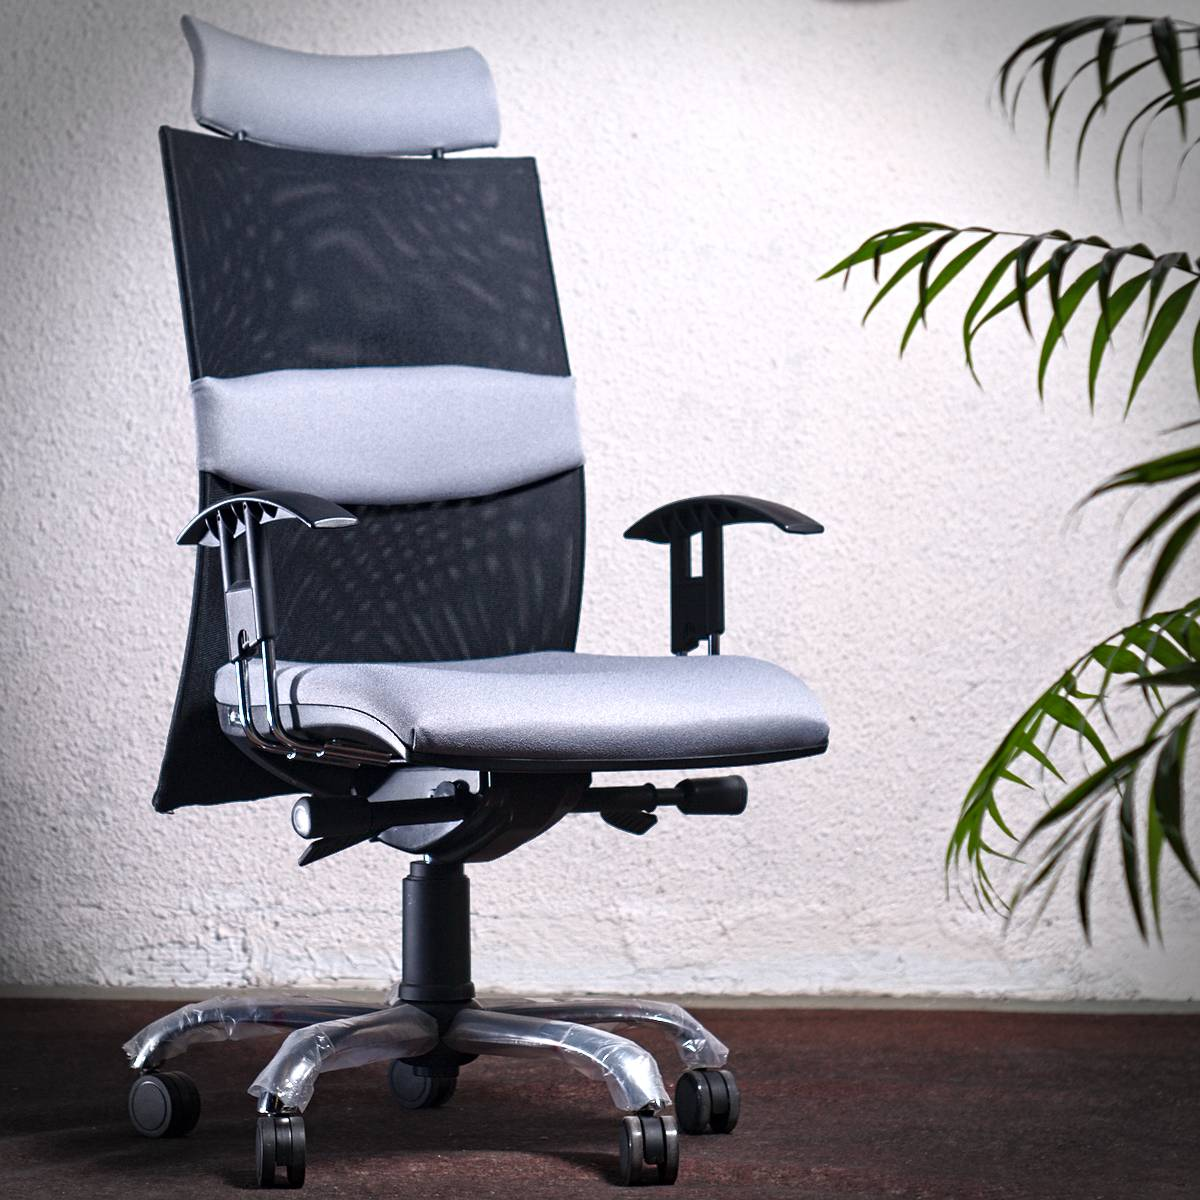 Servicios muebles de oficina reparaci n outlet for Muebles oficina barcelona outlet